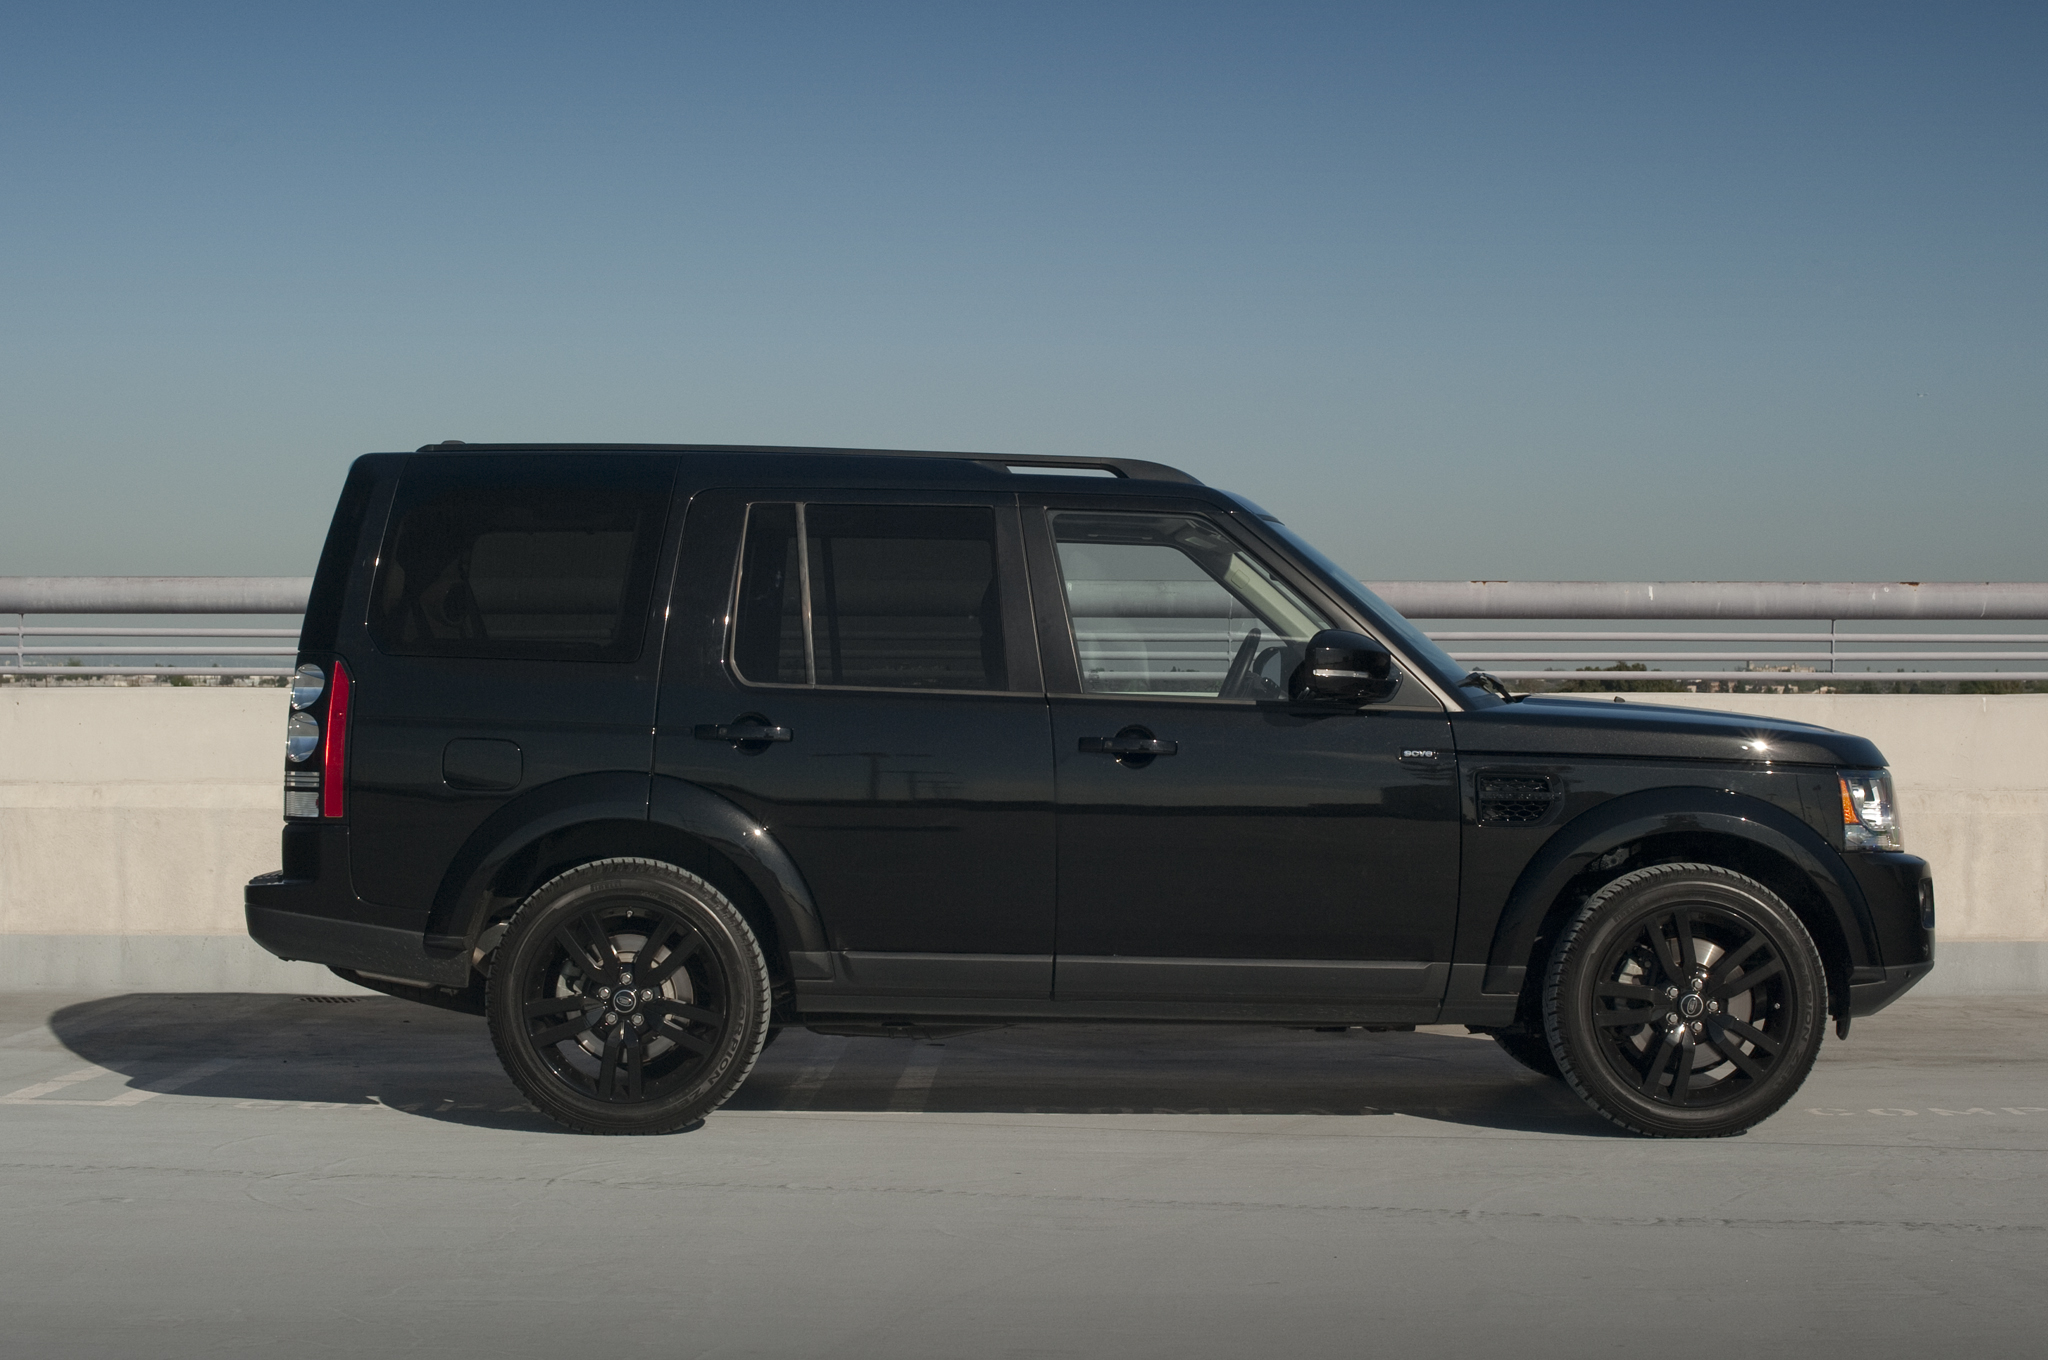 2014 Land Rover >> 2014 LAND ROVER LR4 - Image #11